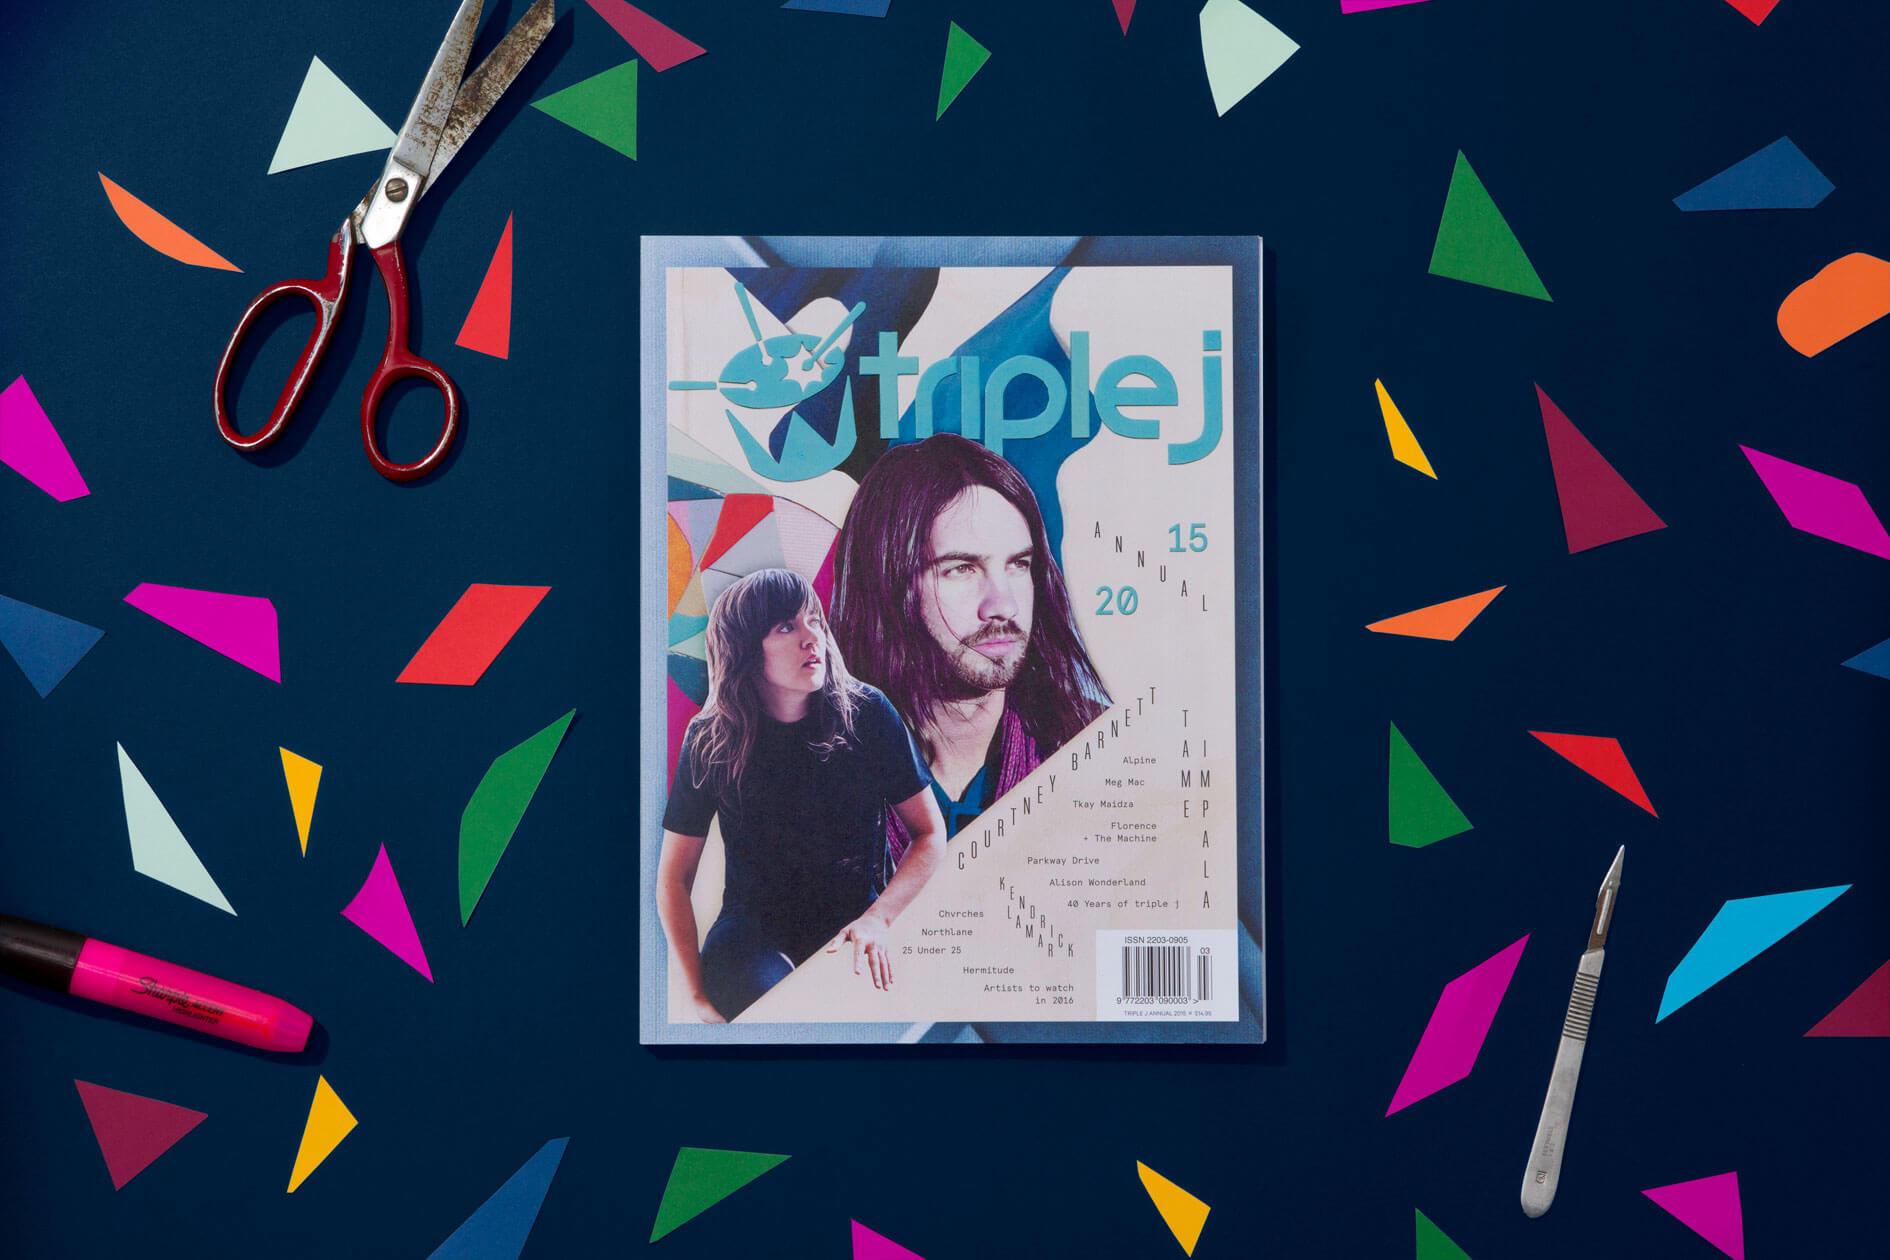 NatCarroll_triplej_Annual_2015_Magazine_Cover_10col